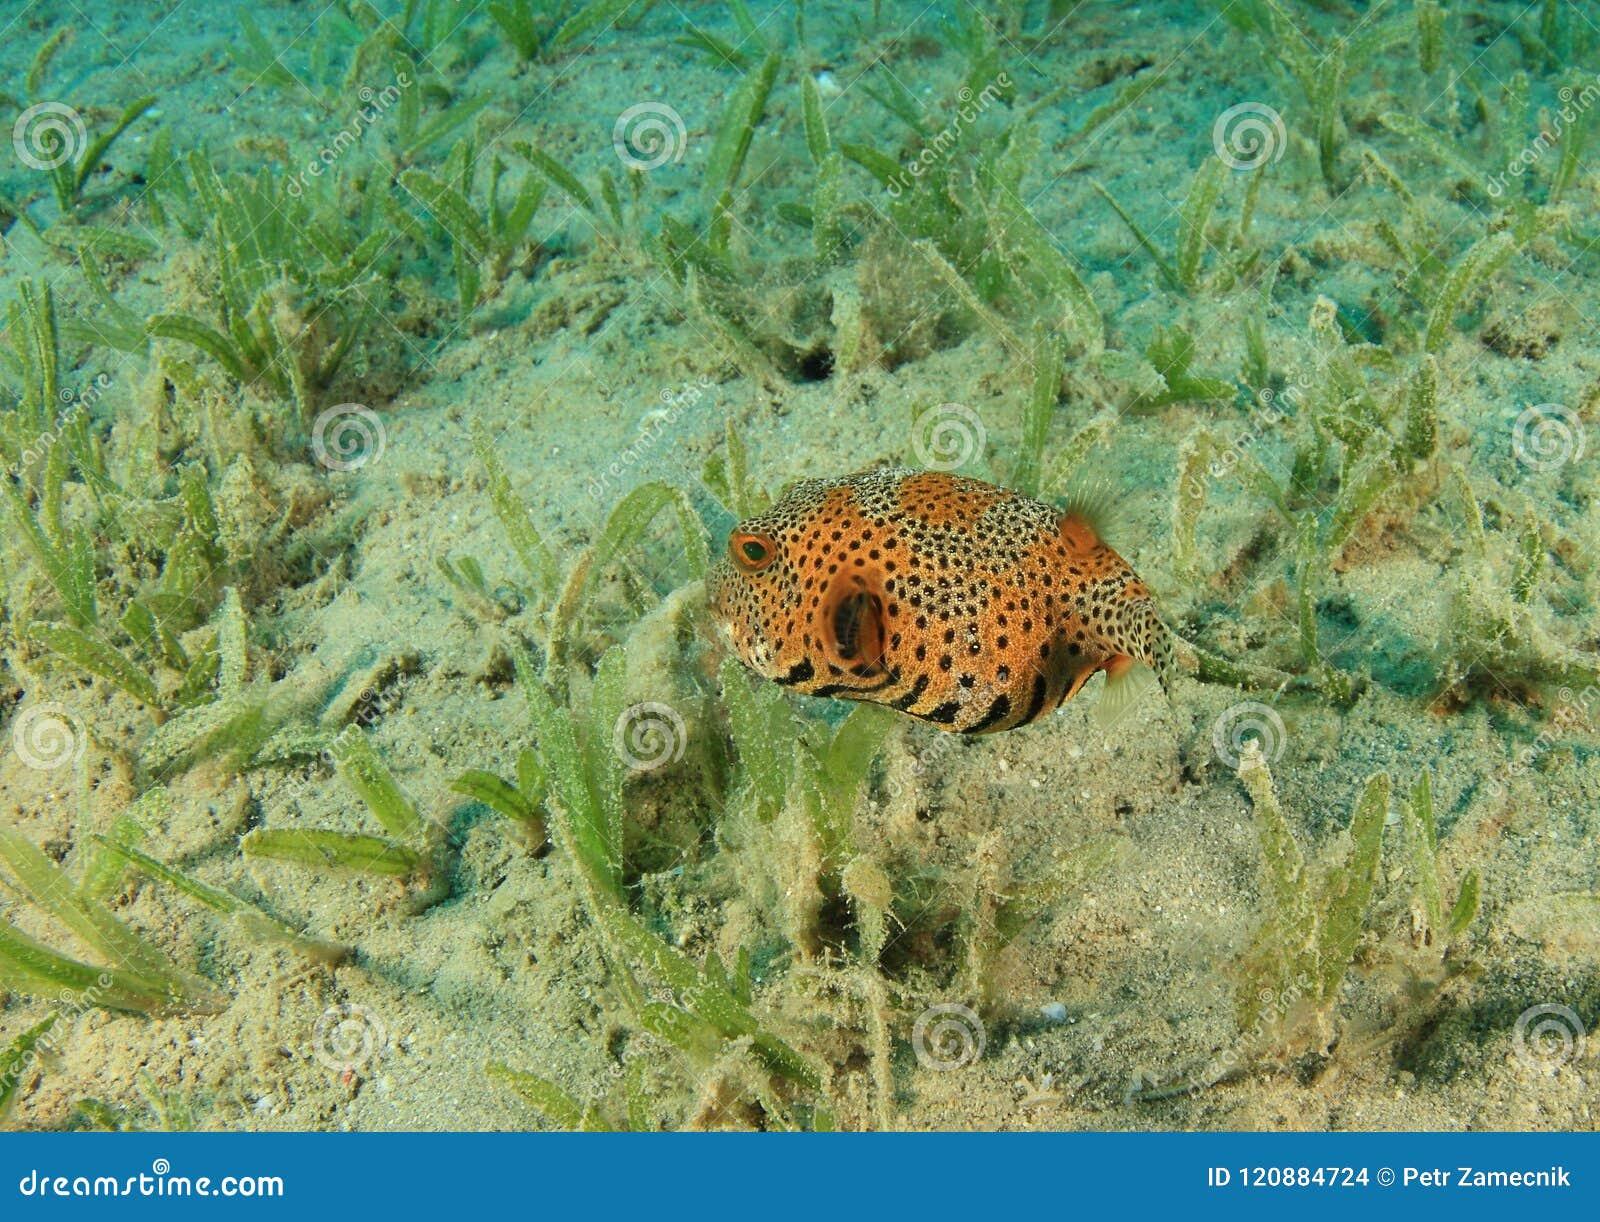 Juvenile fish Giant puffer